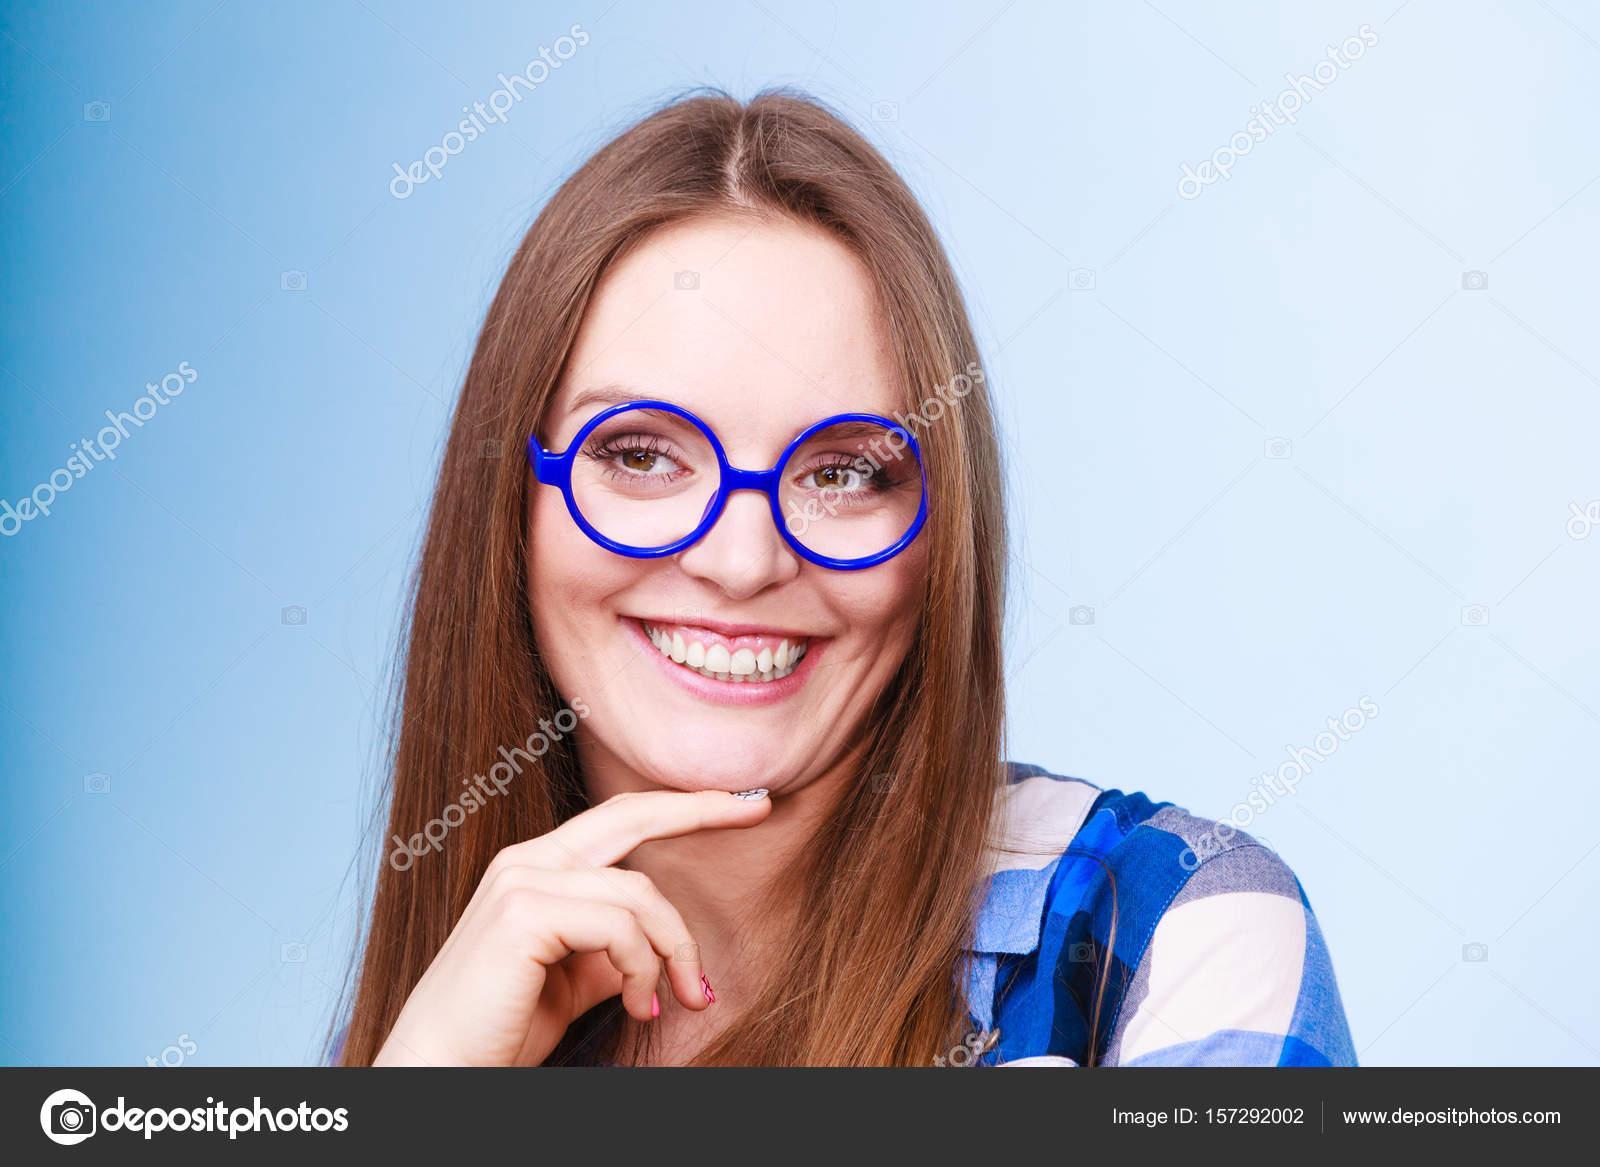 Weird Fun Glasses 7